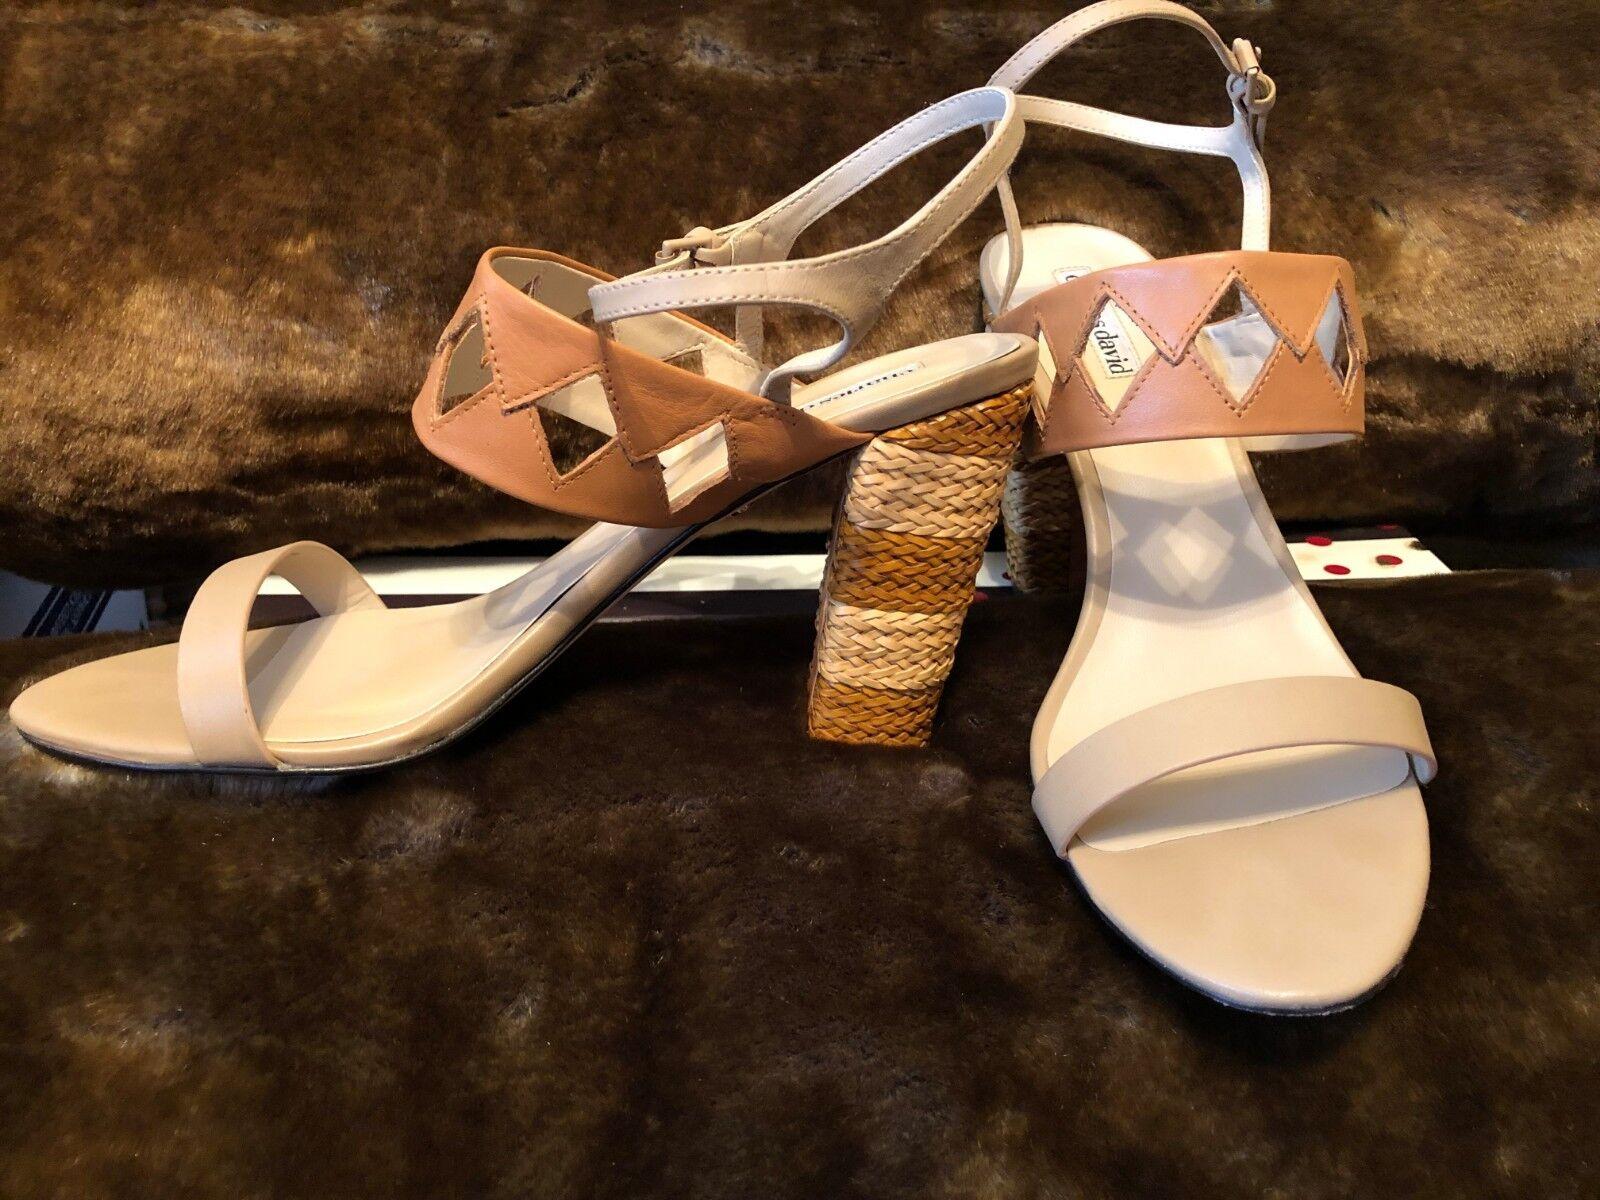 prezzi bassi Charles David JUNGLE Woven Nude Cognac Diamond Diamond Diamond Cutout Sandal Heel US 10 RV  170  garantito